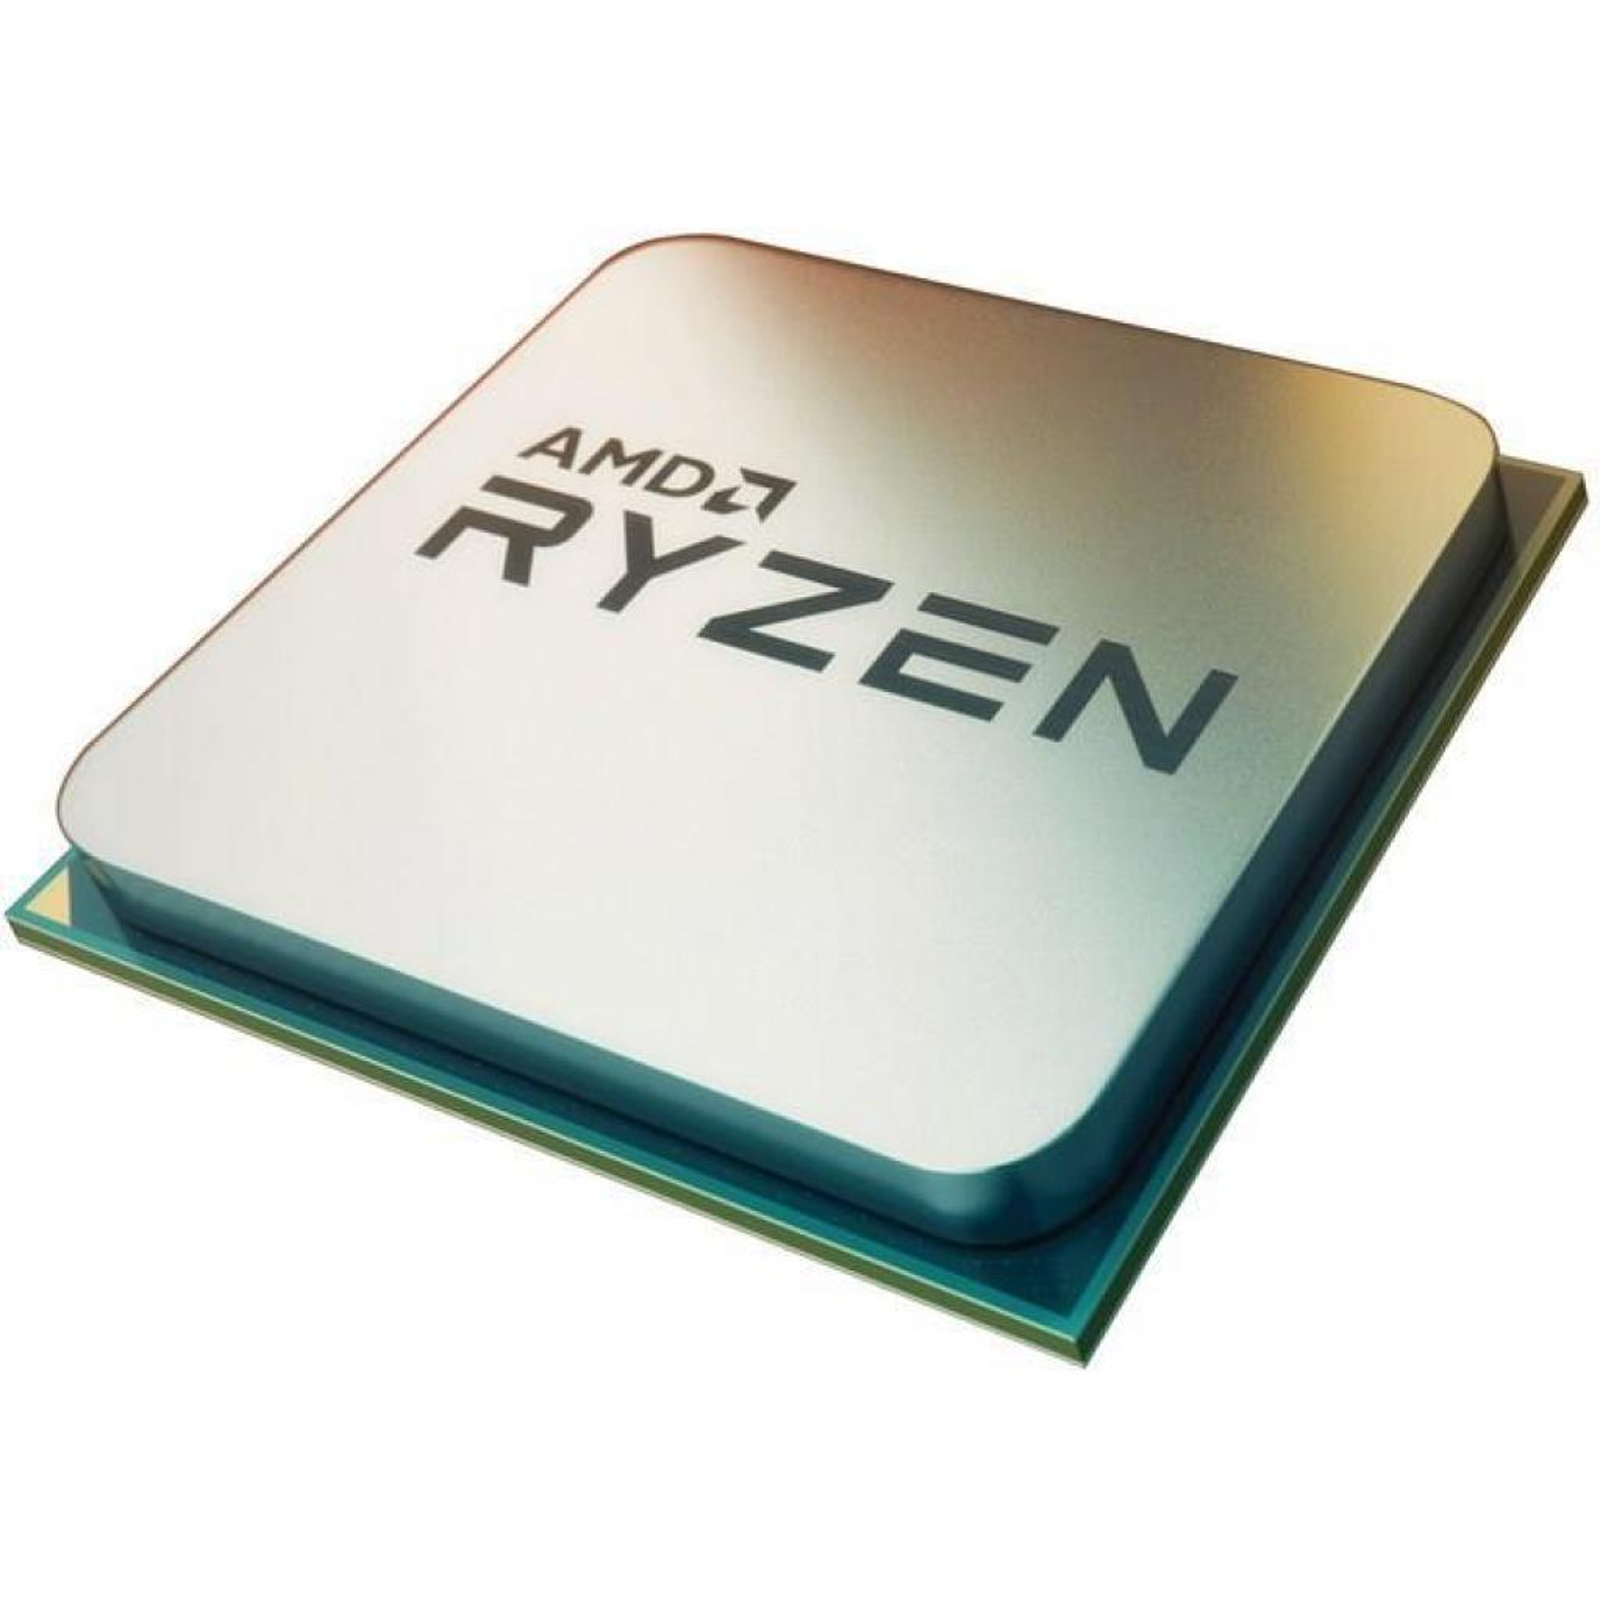 Процесор AMD Ryzen 5 3400G (YD3400C5FHMPK)